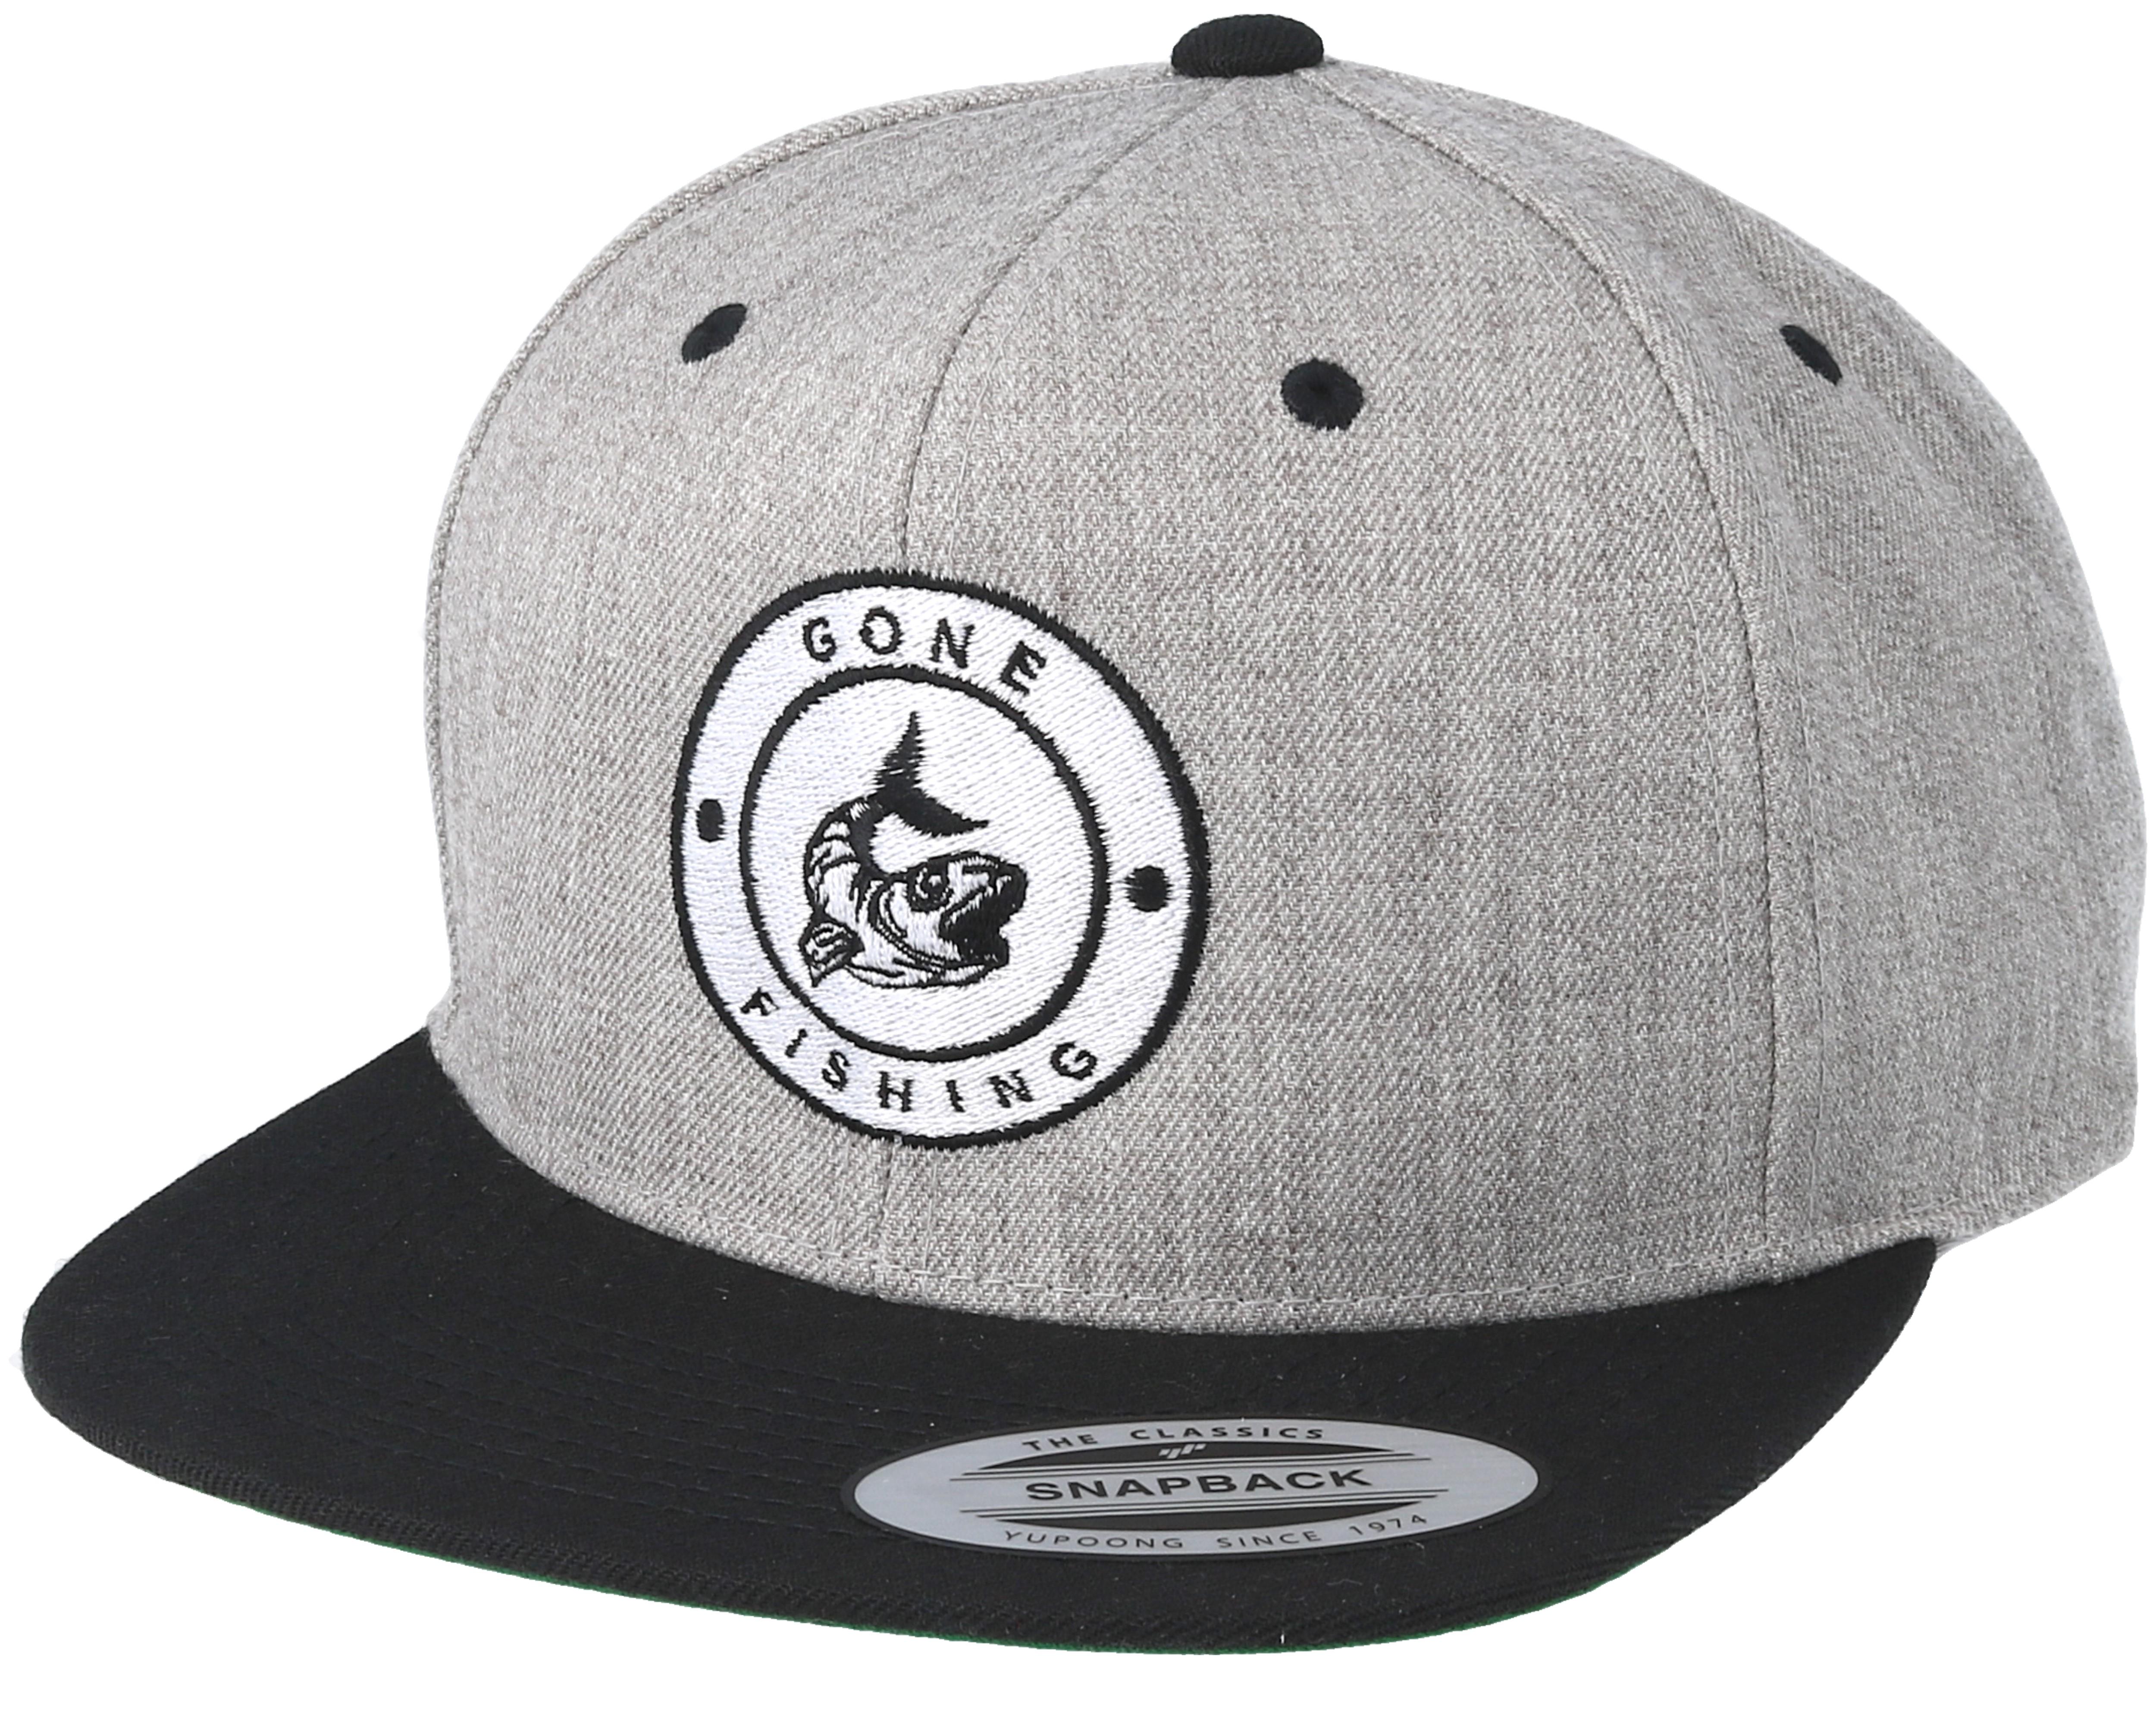 Gone fishing grey black snapback hunter caps hatstore for Fishing snapback hats